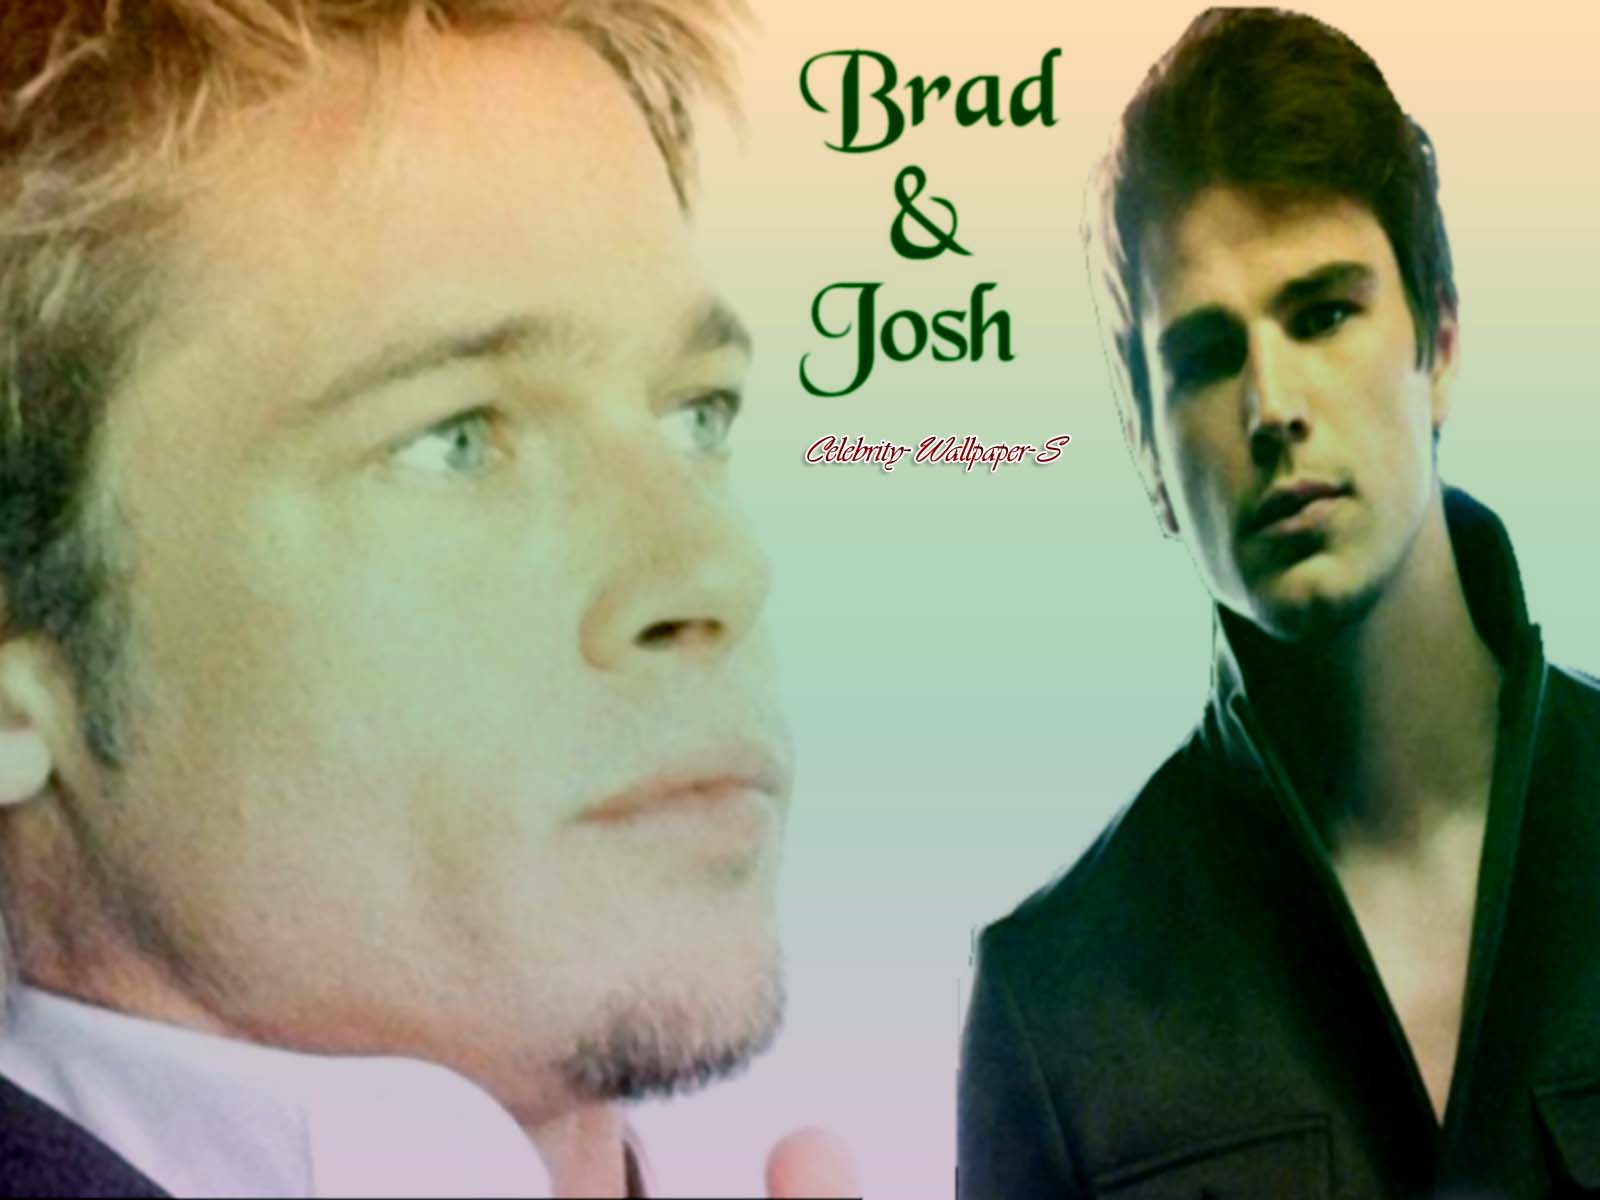 http://1.bp.blogspot.com/_zHx02JB4GE0/TSDy4GUzgcI/AAAAAAAAAYw/K-iMHc3hn_c/s1600/Brad+Pitt+Josh+Hartnett.jpg